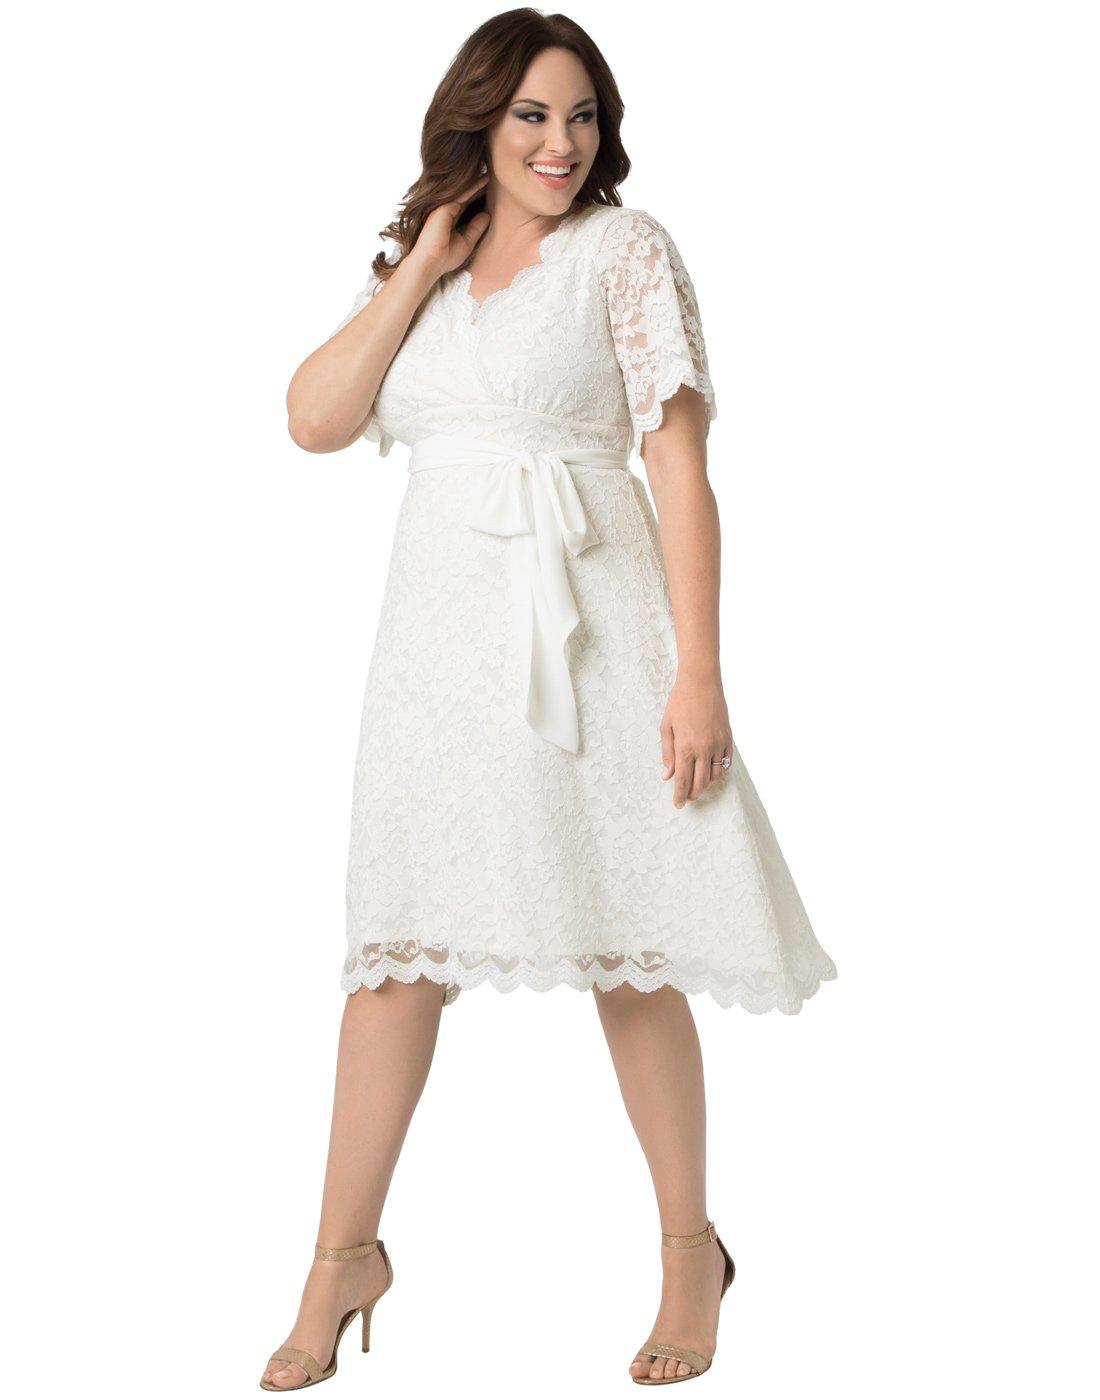 Kiyonna Women's Plus Size Graced With Love Wedding Dress 2X Ivory